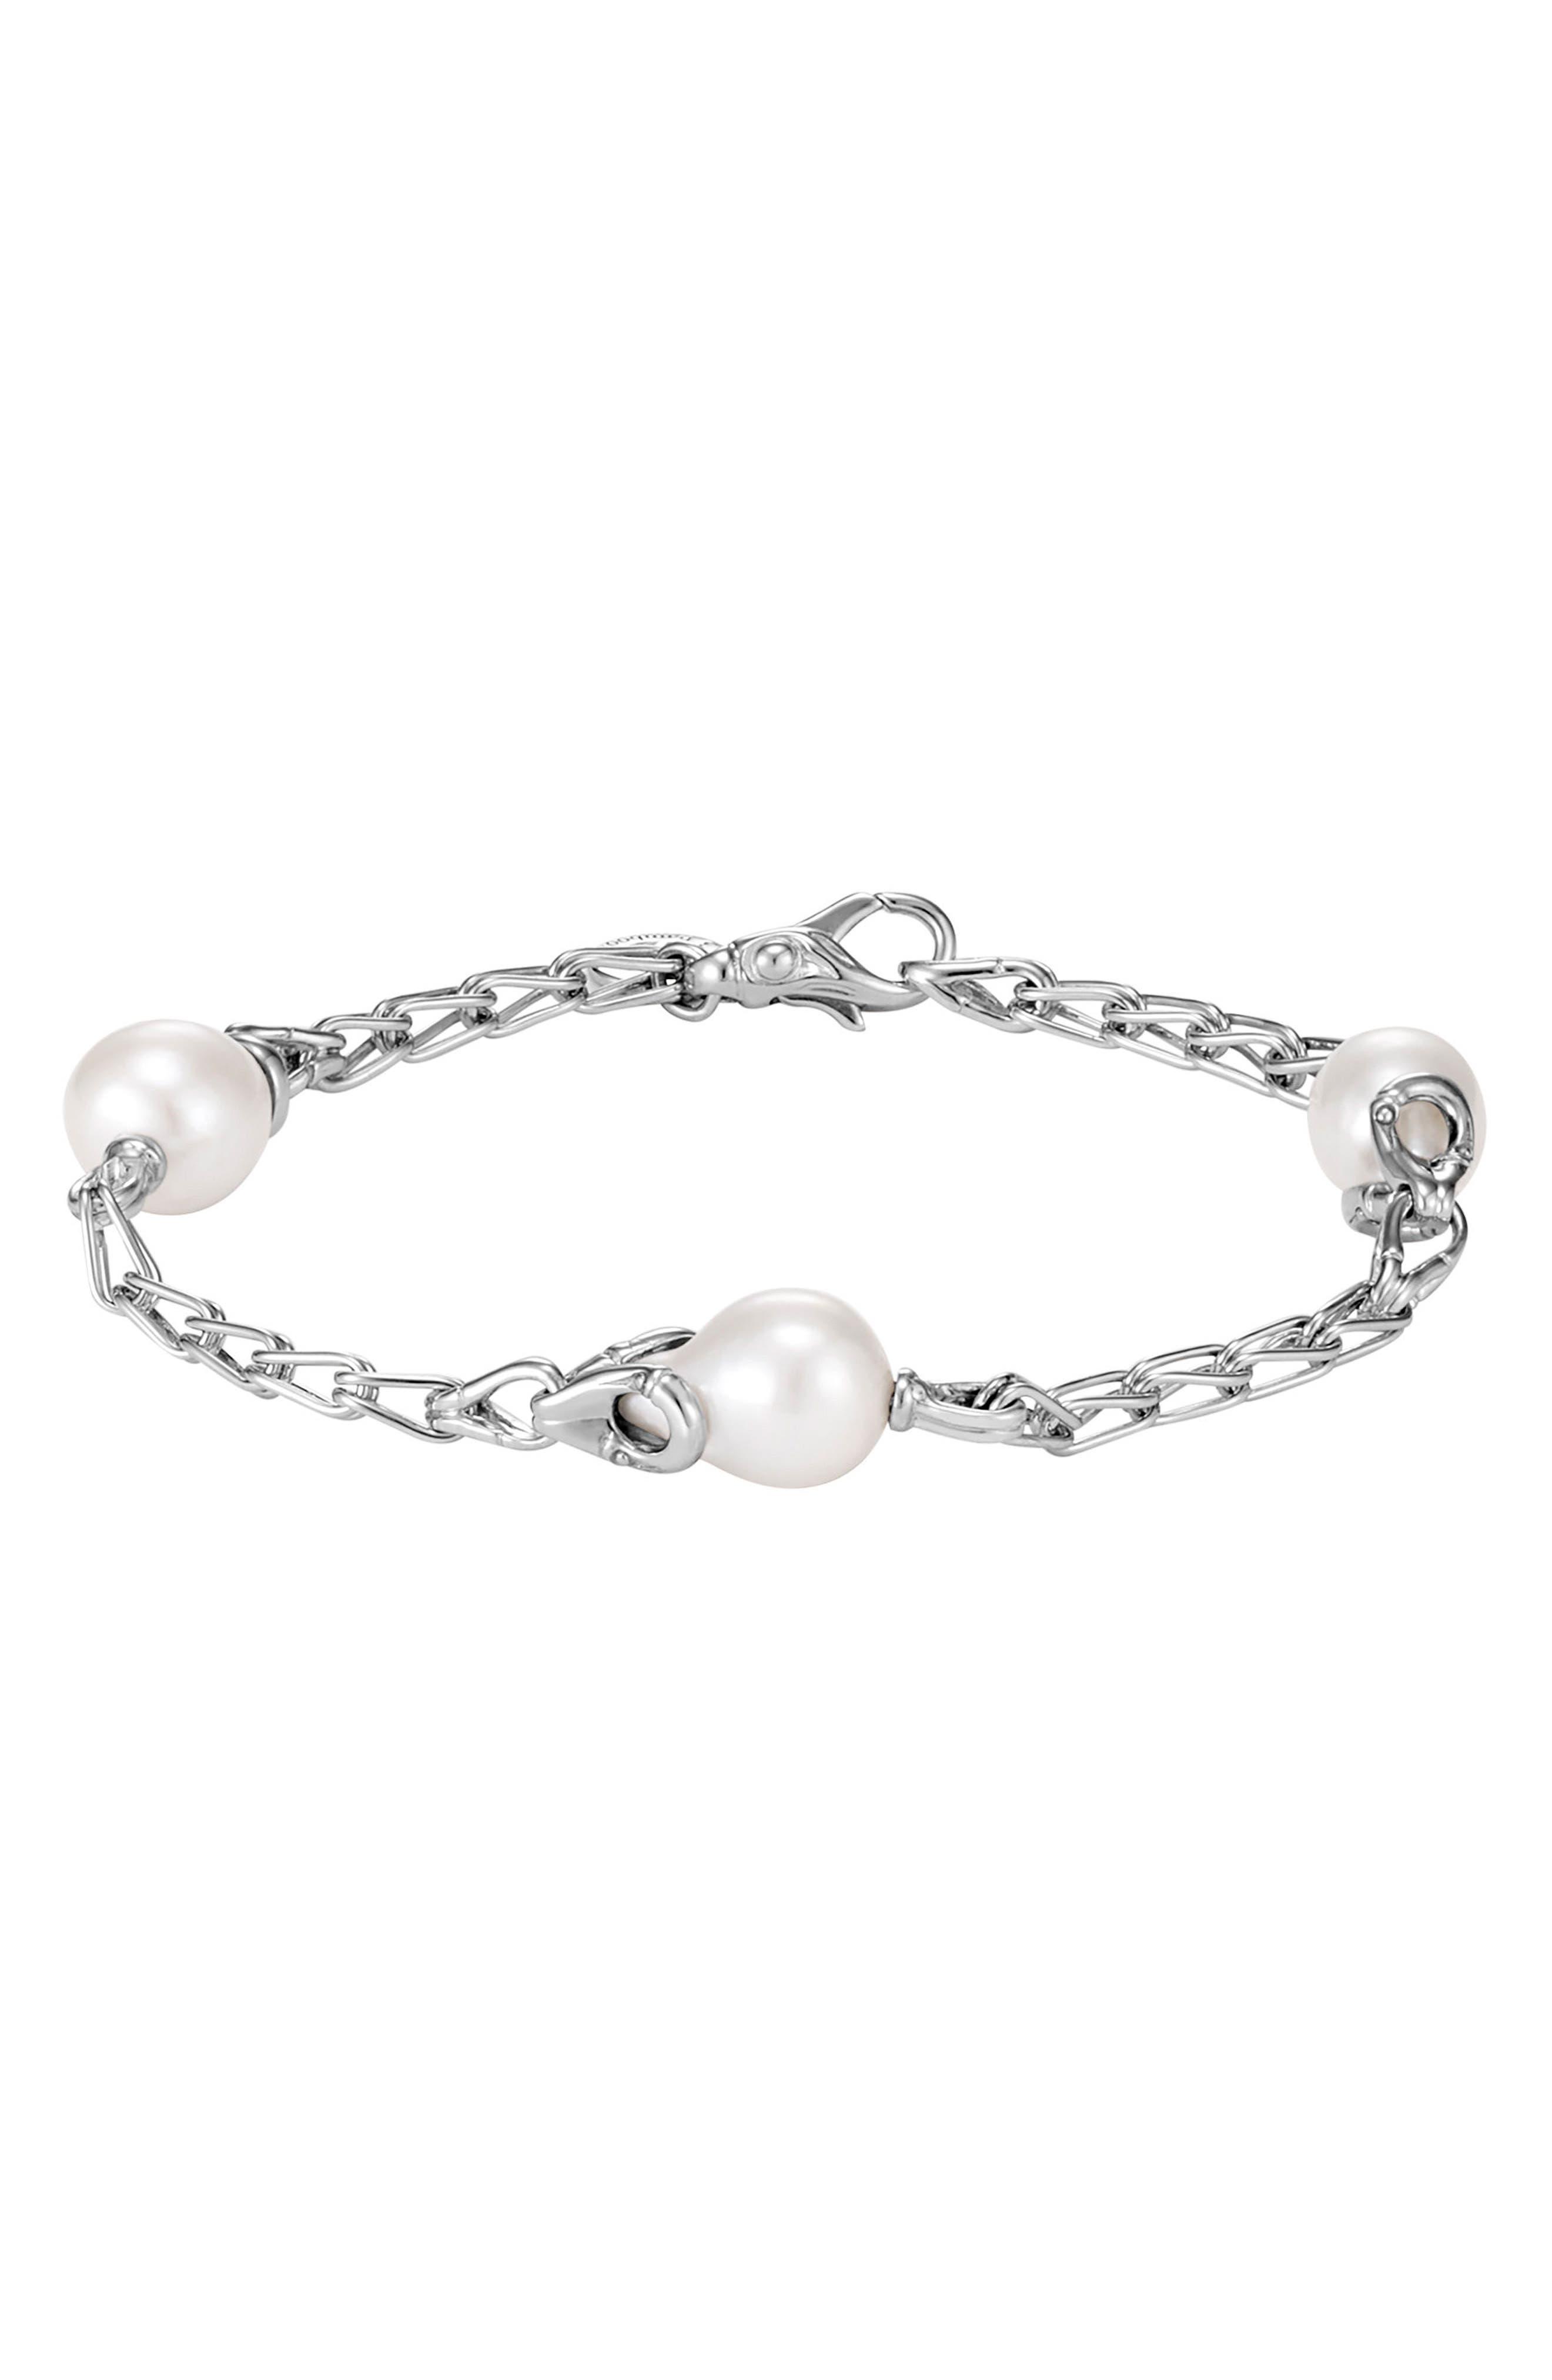 Bamboo Pearl Station Bracelet,                             Main thumbnail 1, color,                             Silver/ Pearl